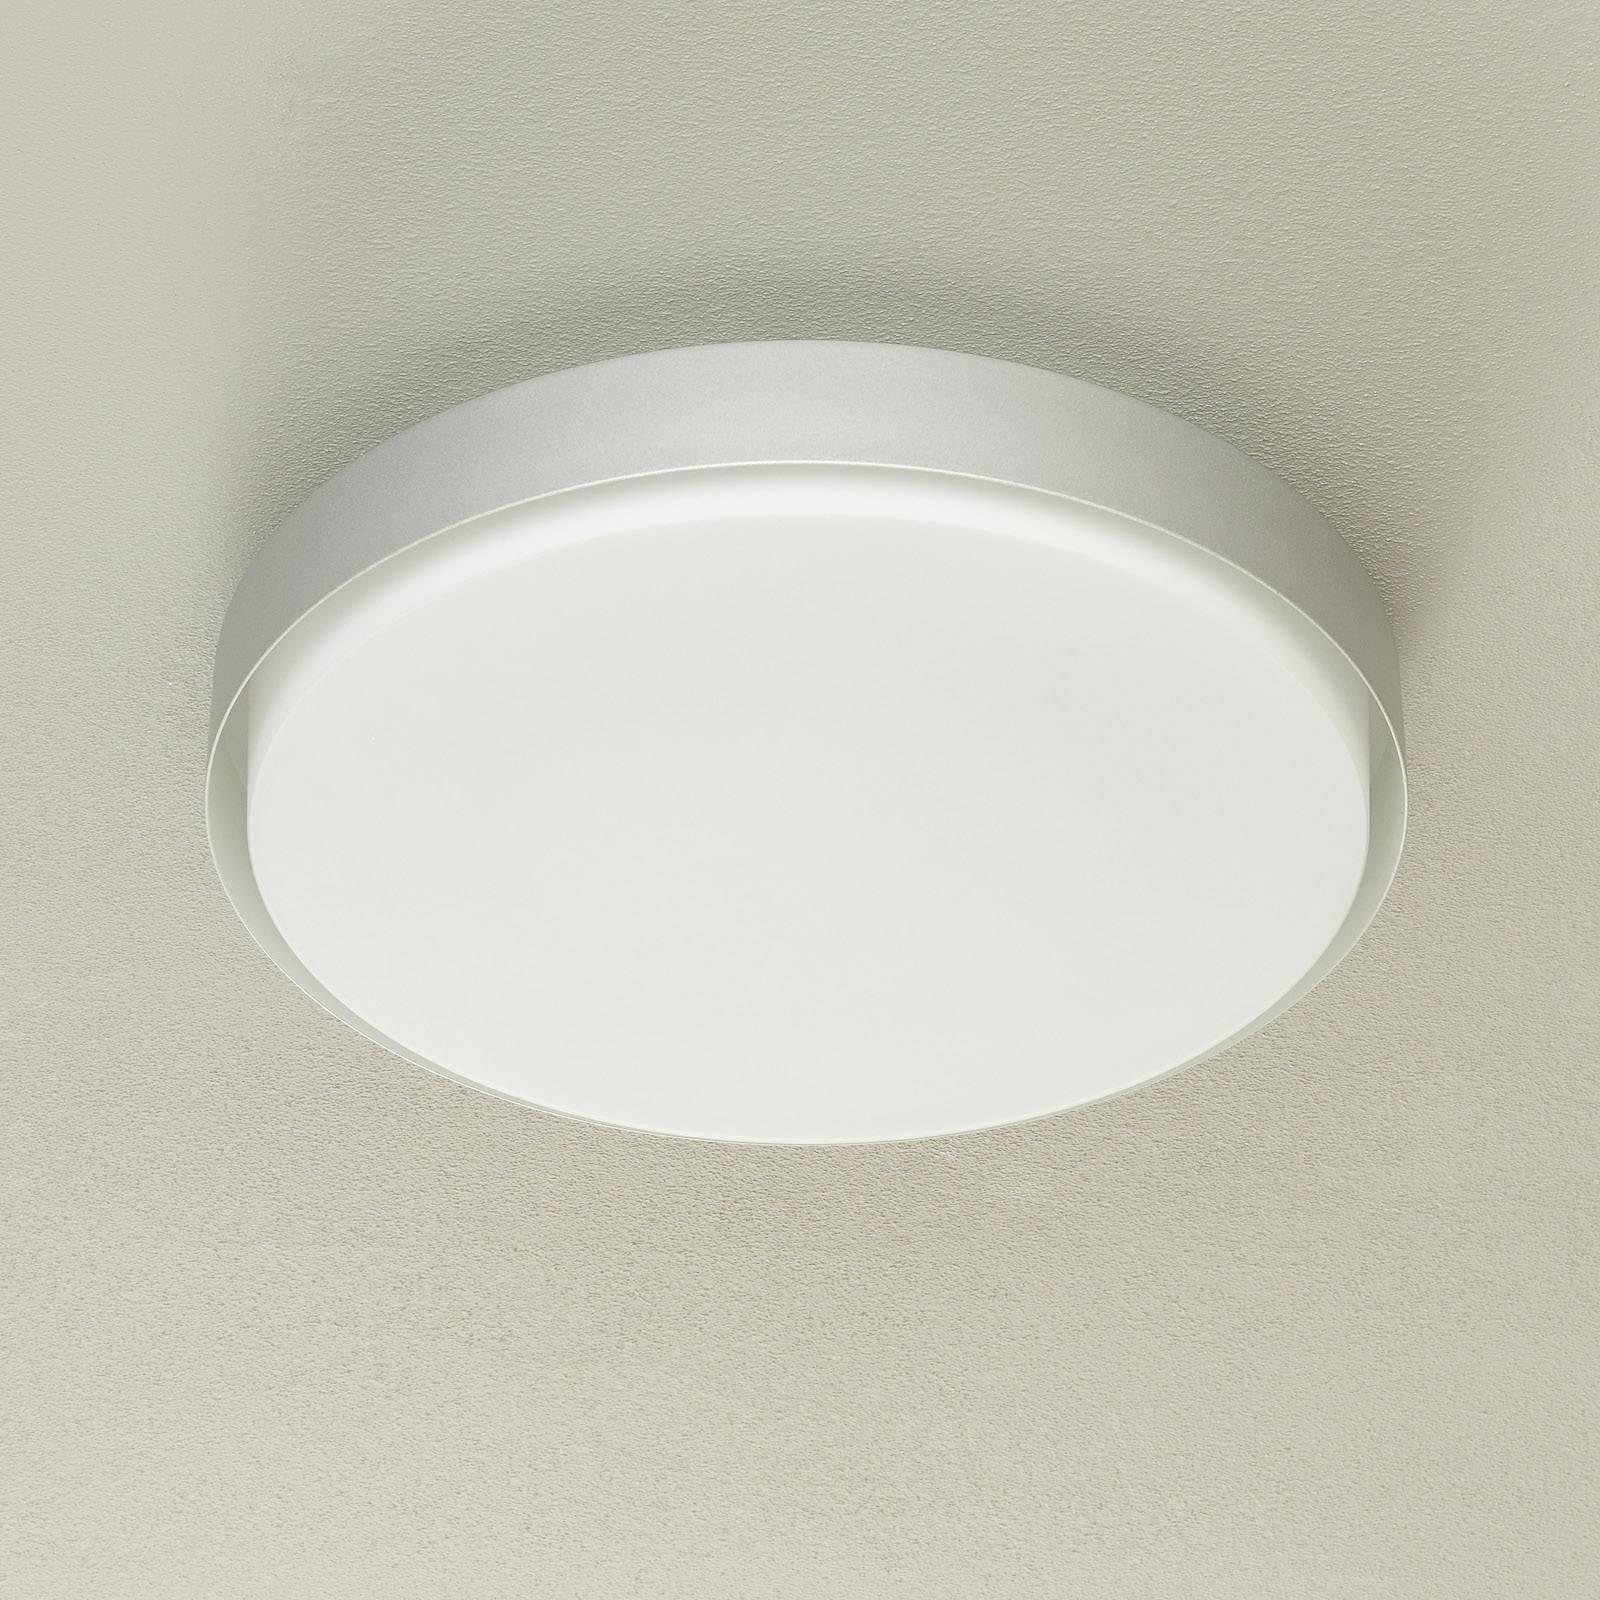 BEGA 12165 LED-kattovalaisin, alumiini, Ø 50 cm